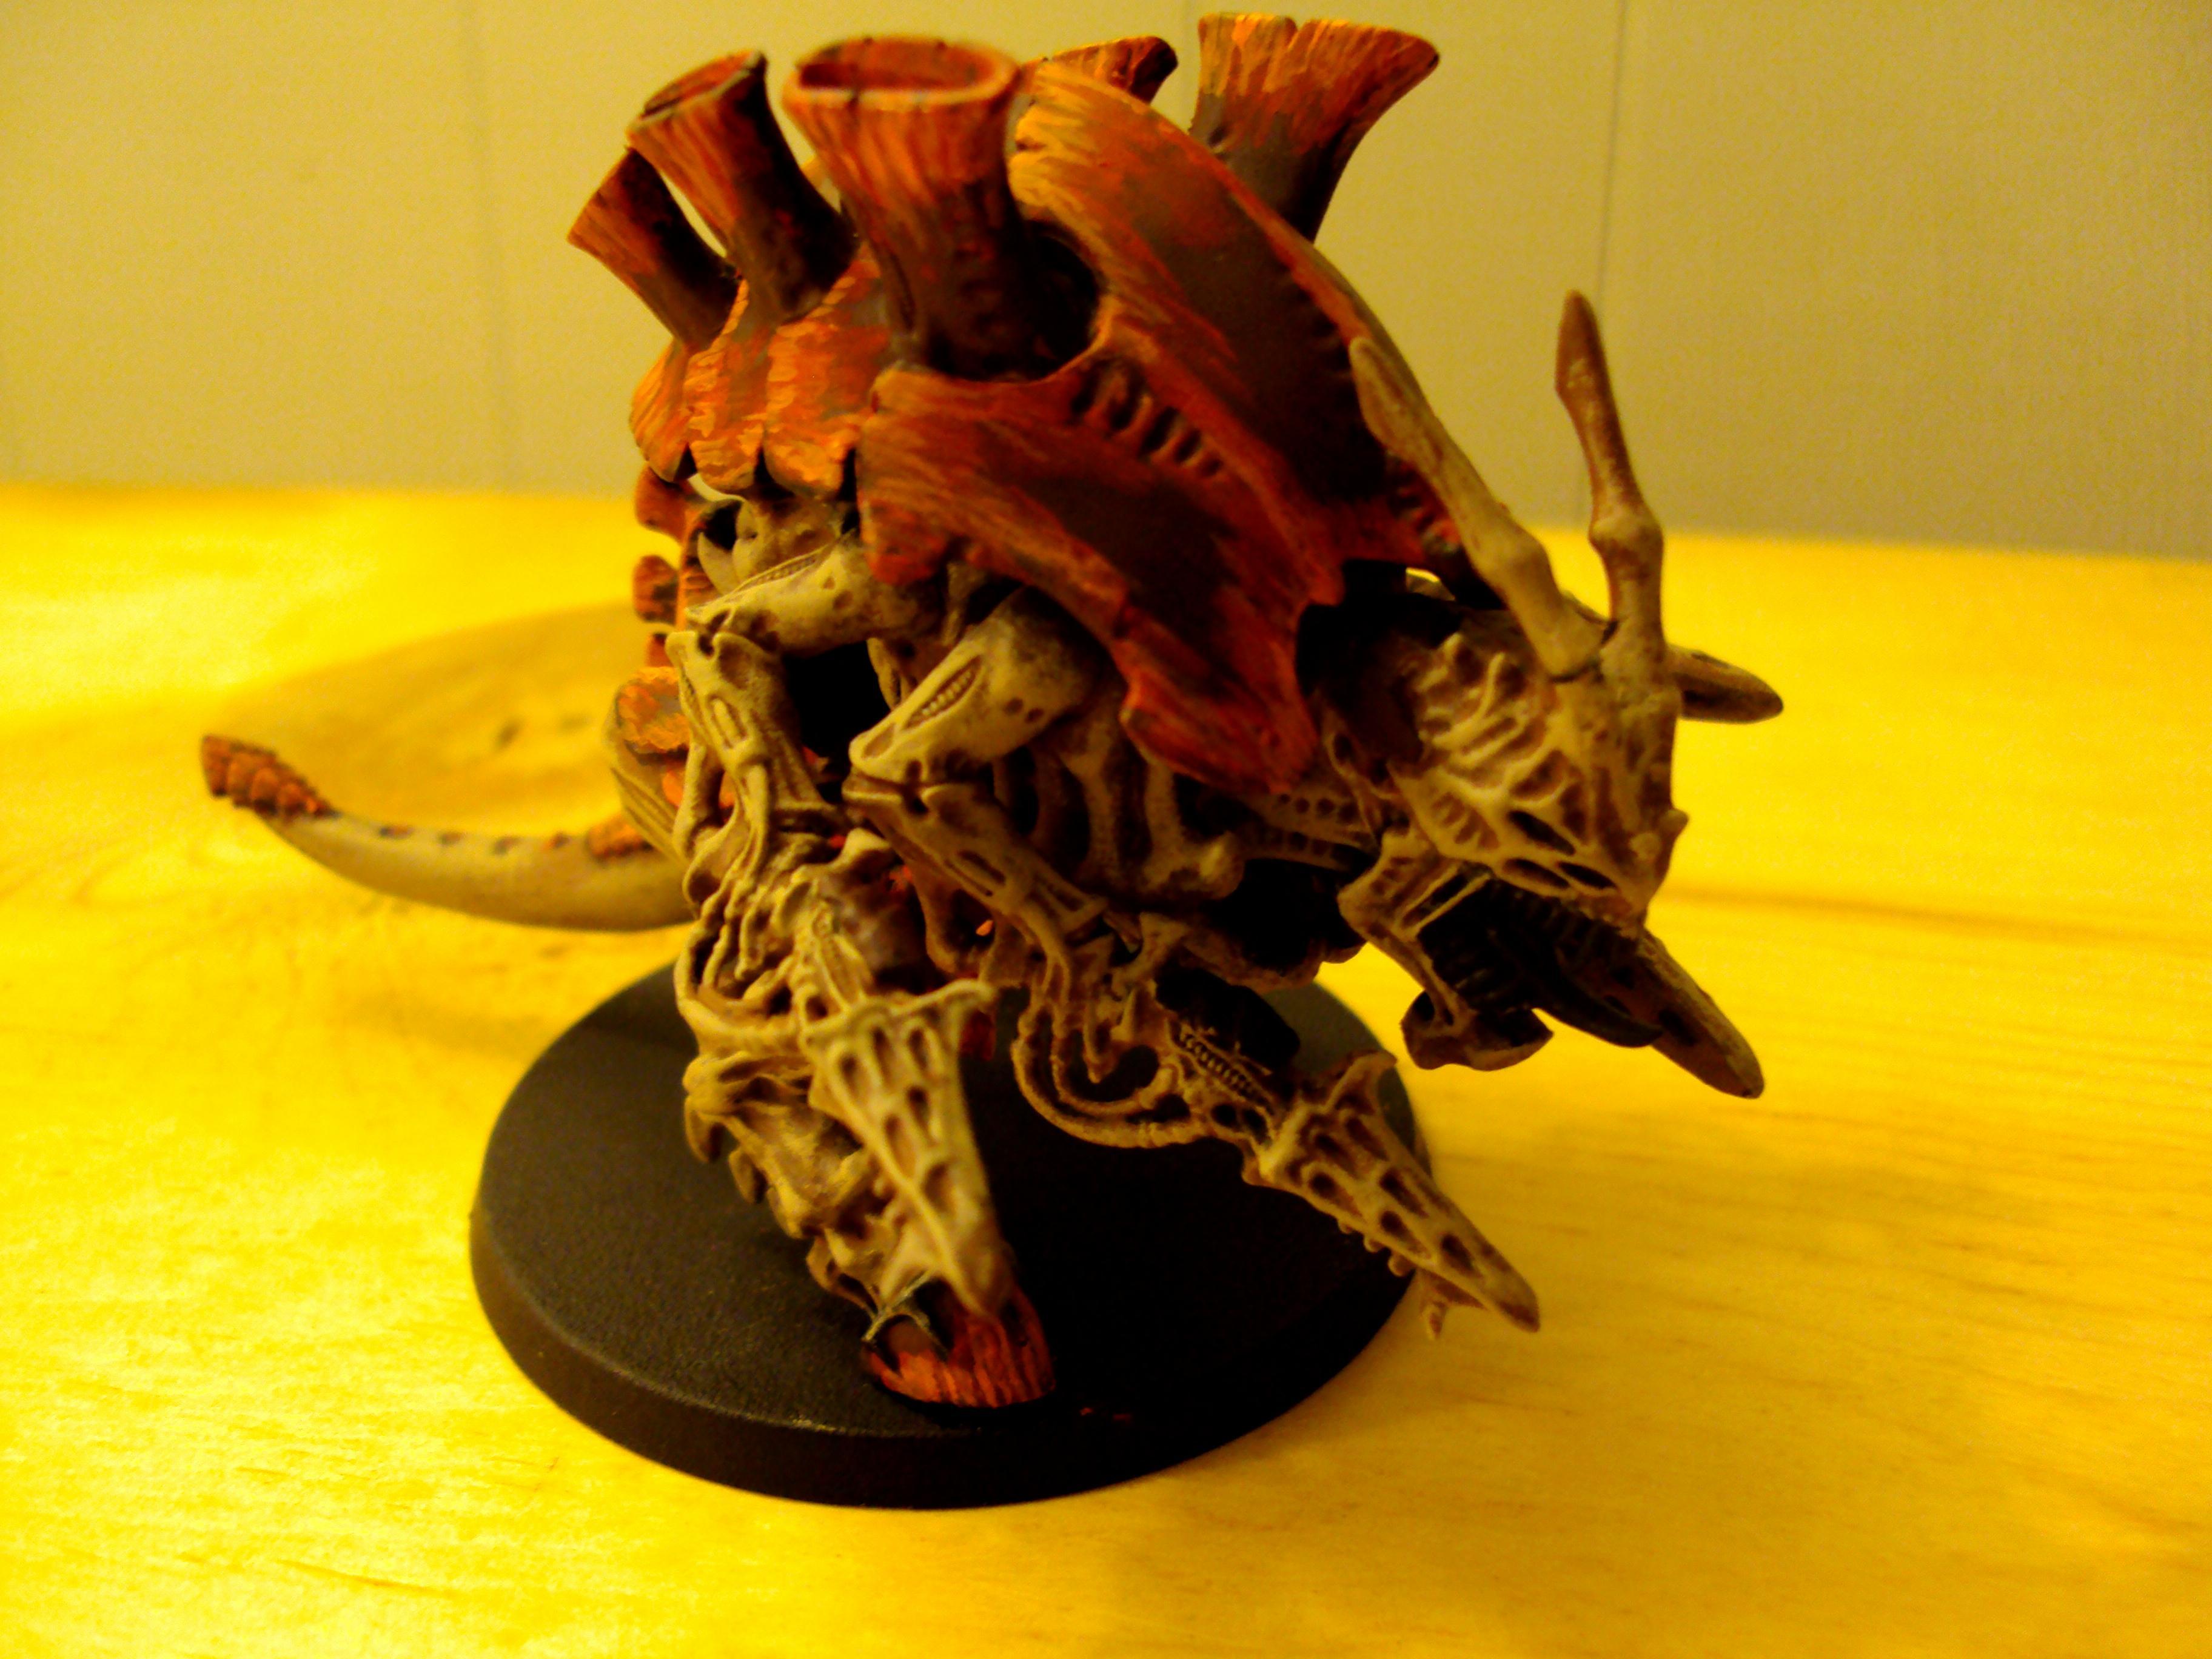 Carnifex, Hive Fleet Kraken, Tyranids